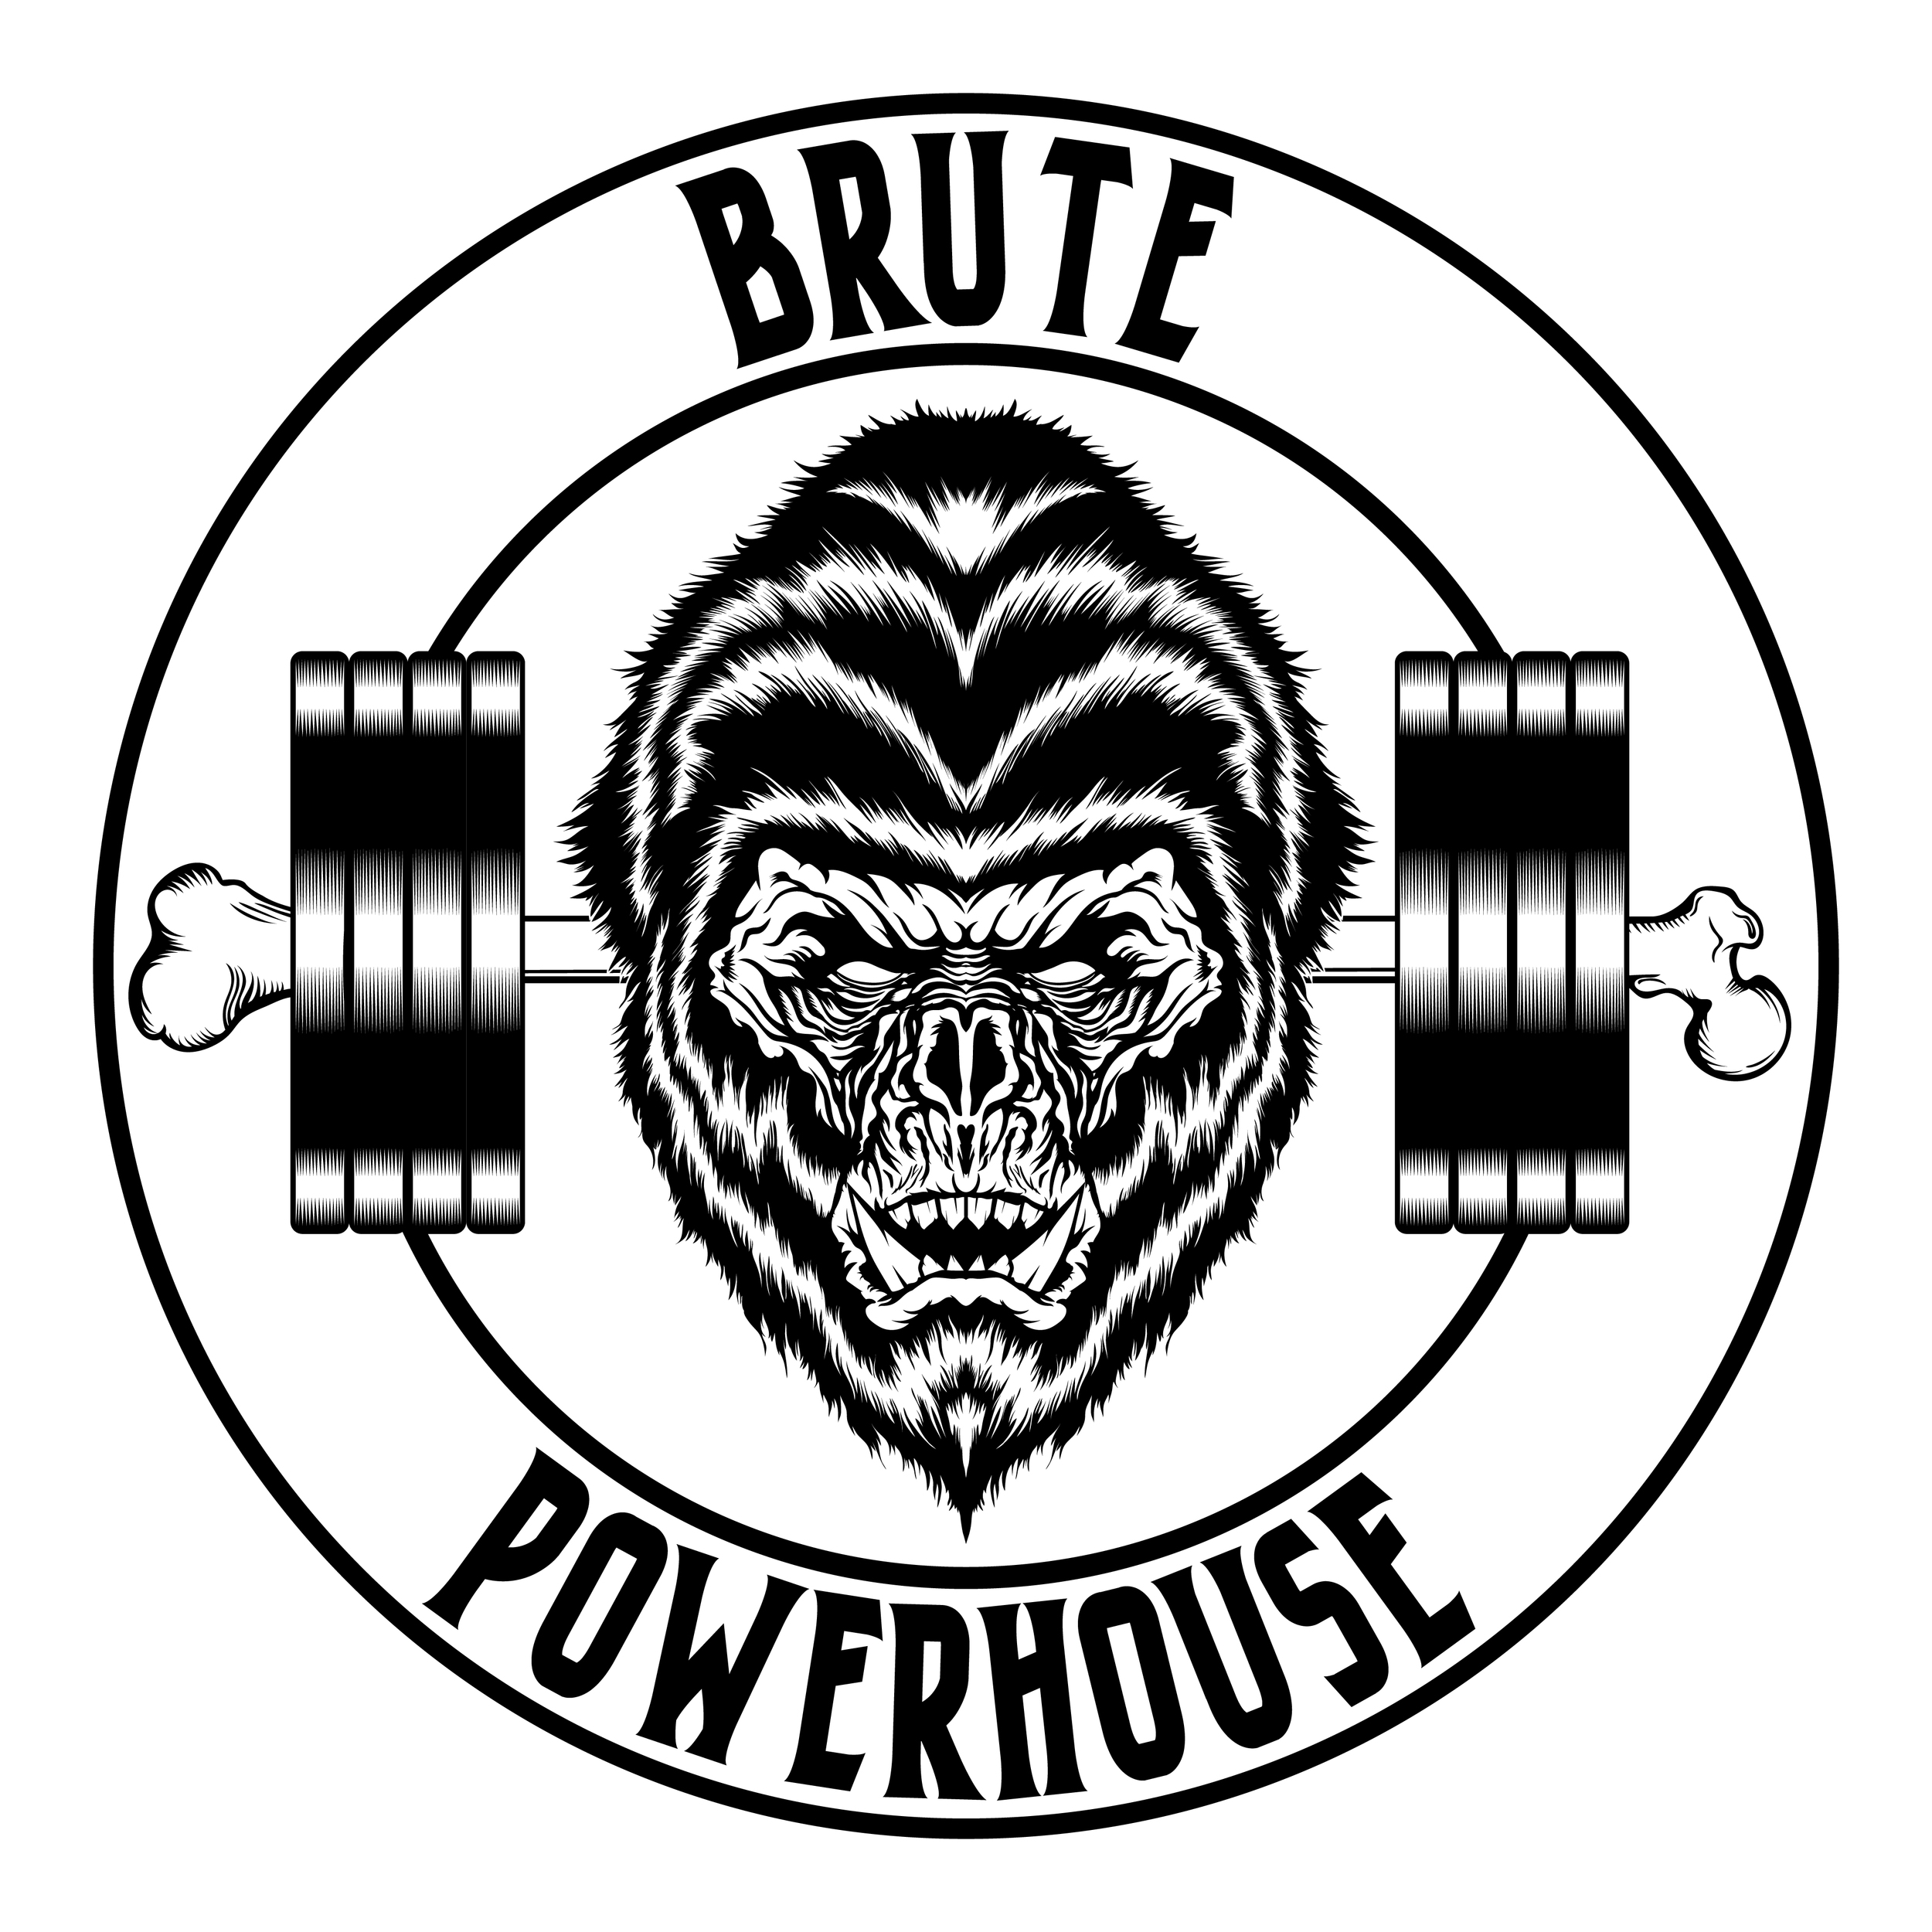 brute-powerhouse-illustration-logo-adobe-illustrator-vector-art-artist-gorilla-monster-ape-savage-gym-crossfit-powerlifting-roberto-orozco-design-graphic-designer-black-white-circle-logos-2.jpg